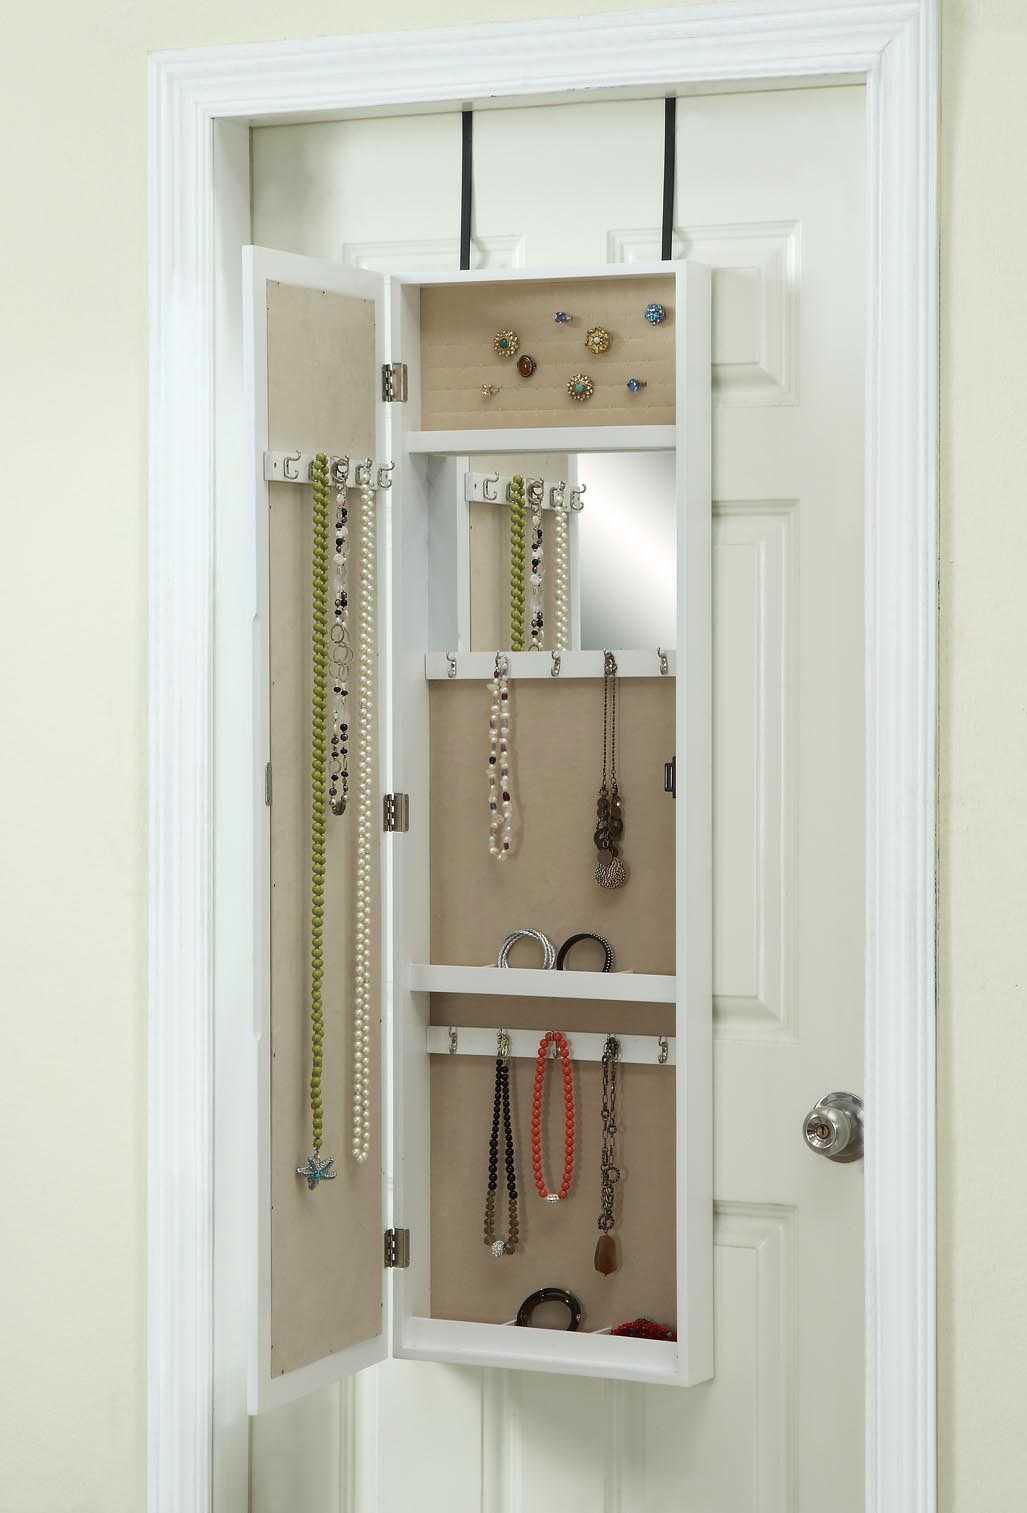 Cermin sekaligus tempat penyimpanan aksesoris, via decoist.com